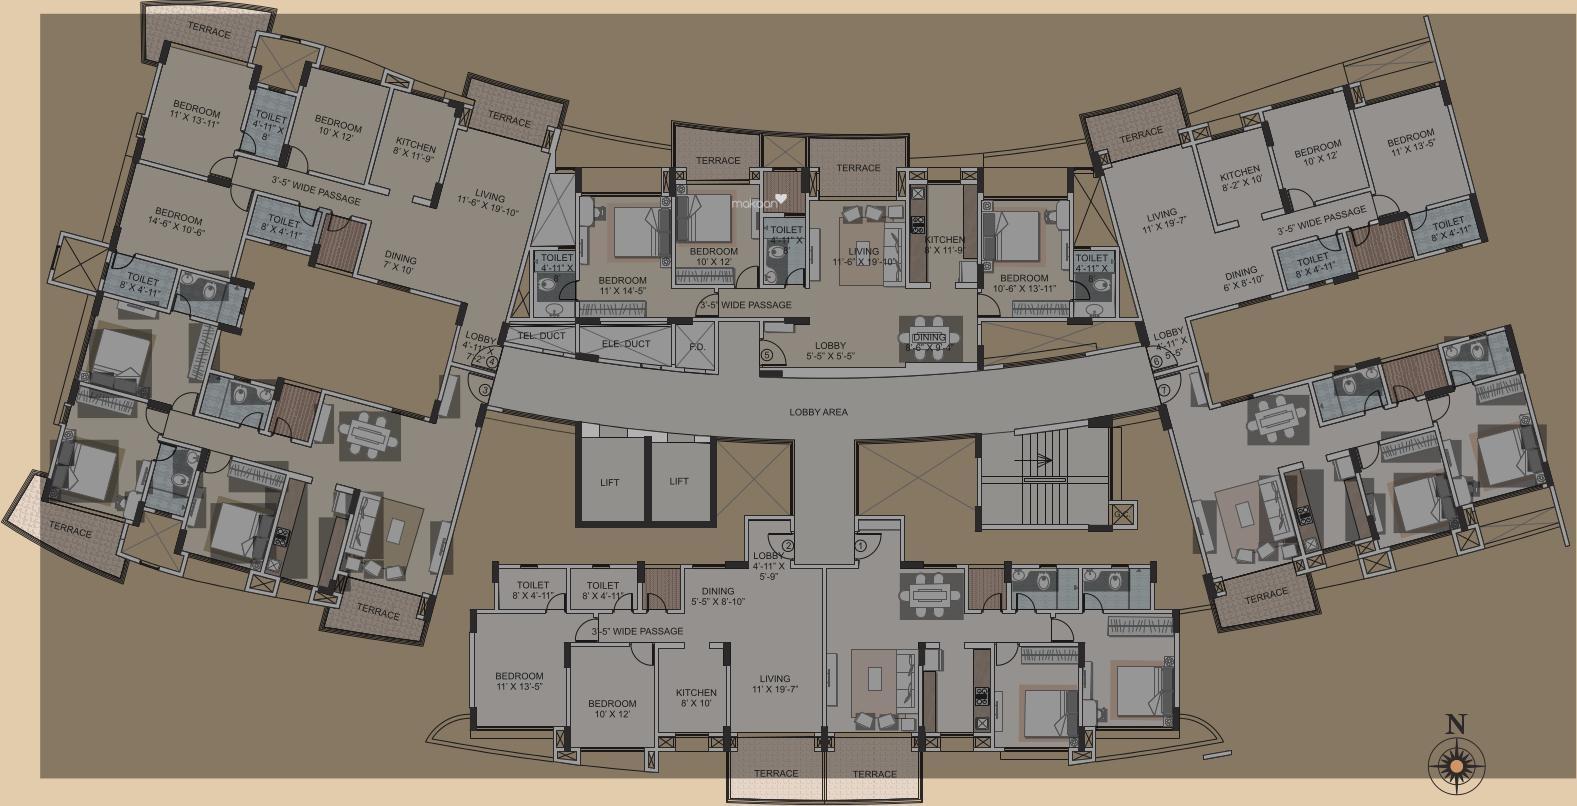 17 Harmonious Floor Plan Building New in